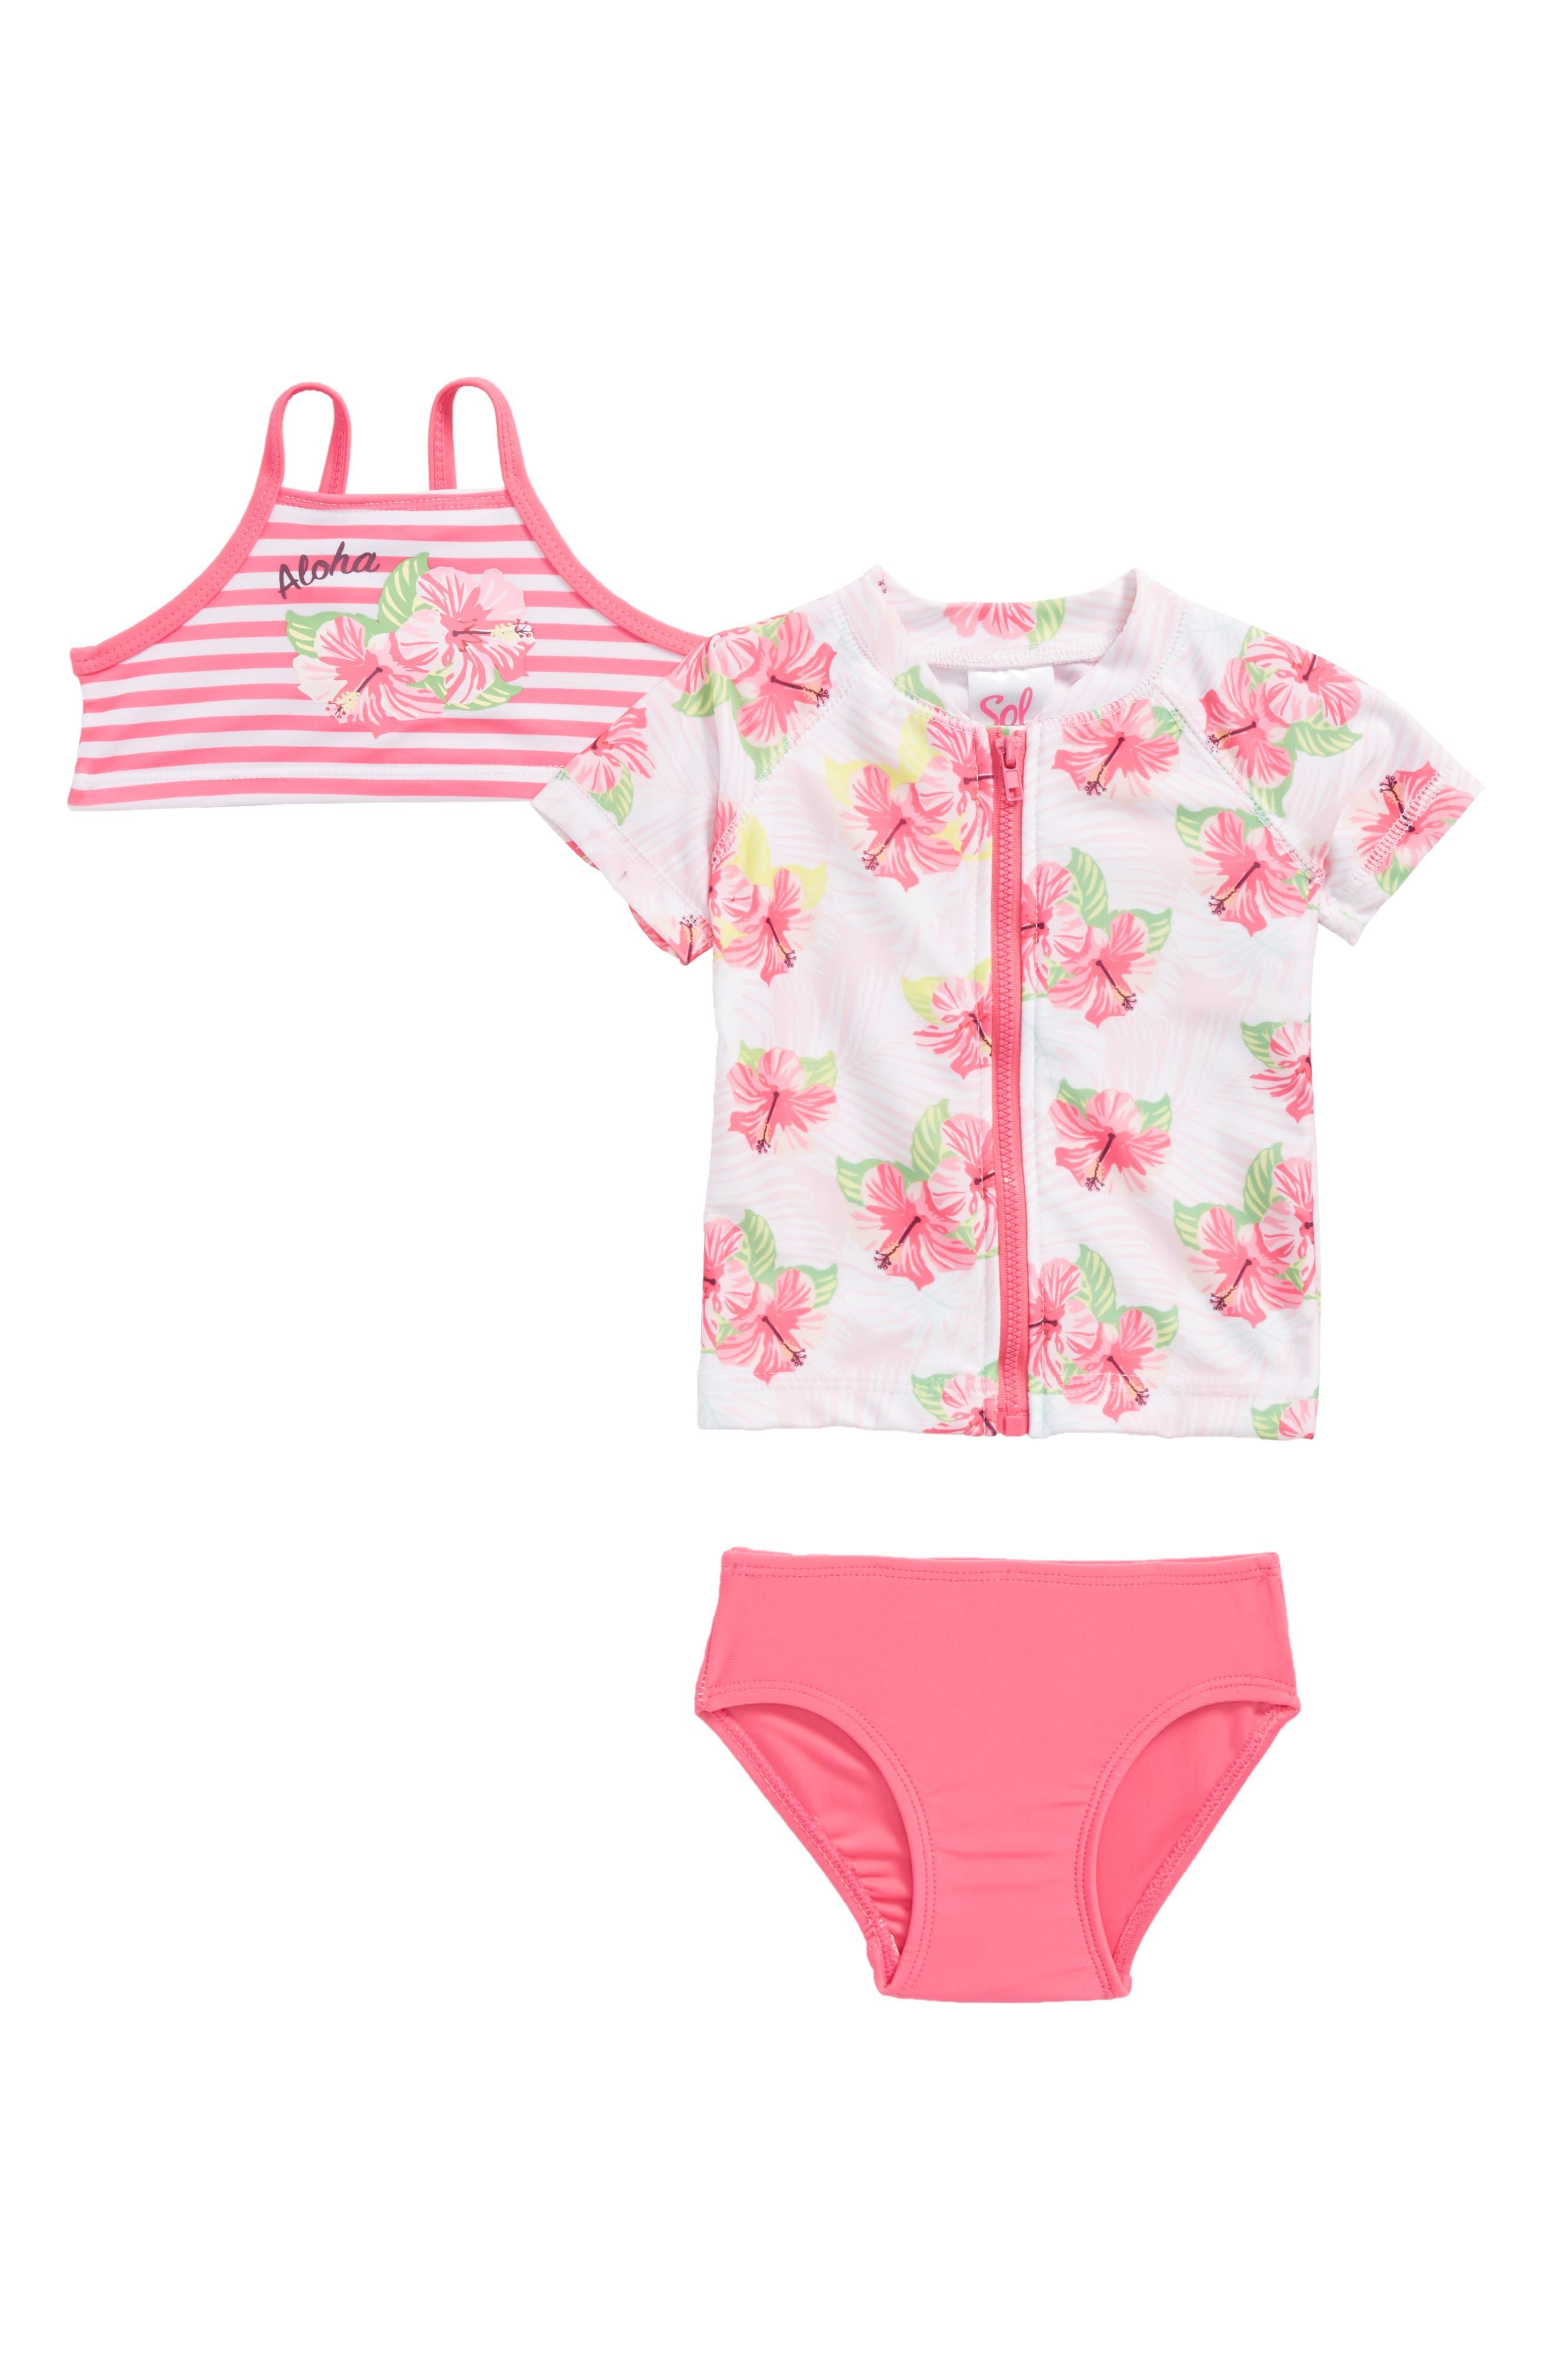 Honolulu Two-Piece Swimsuit with Rashguard,                         Main,                         color, 699